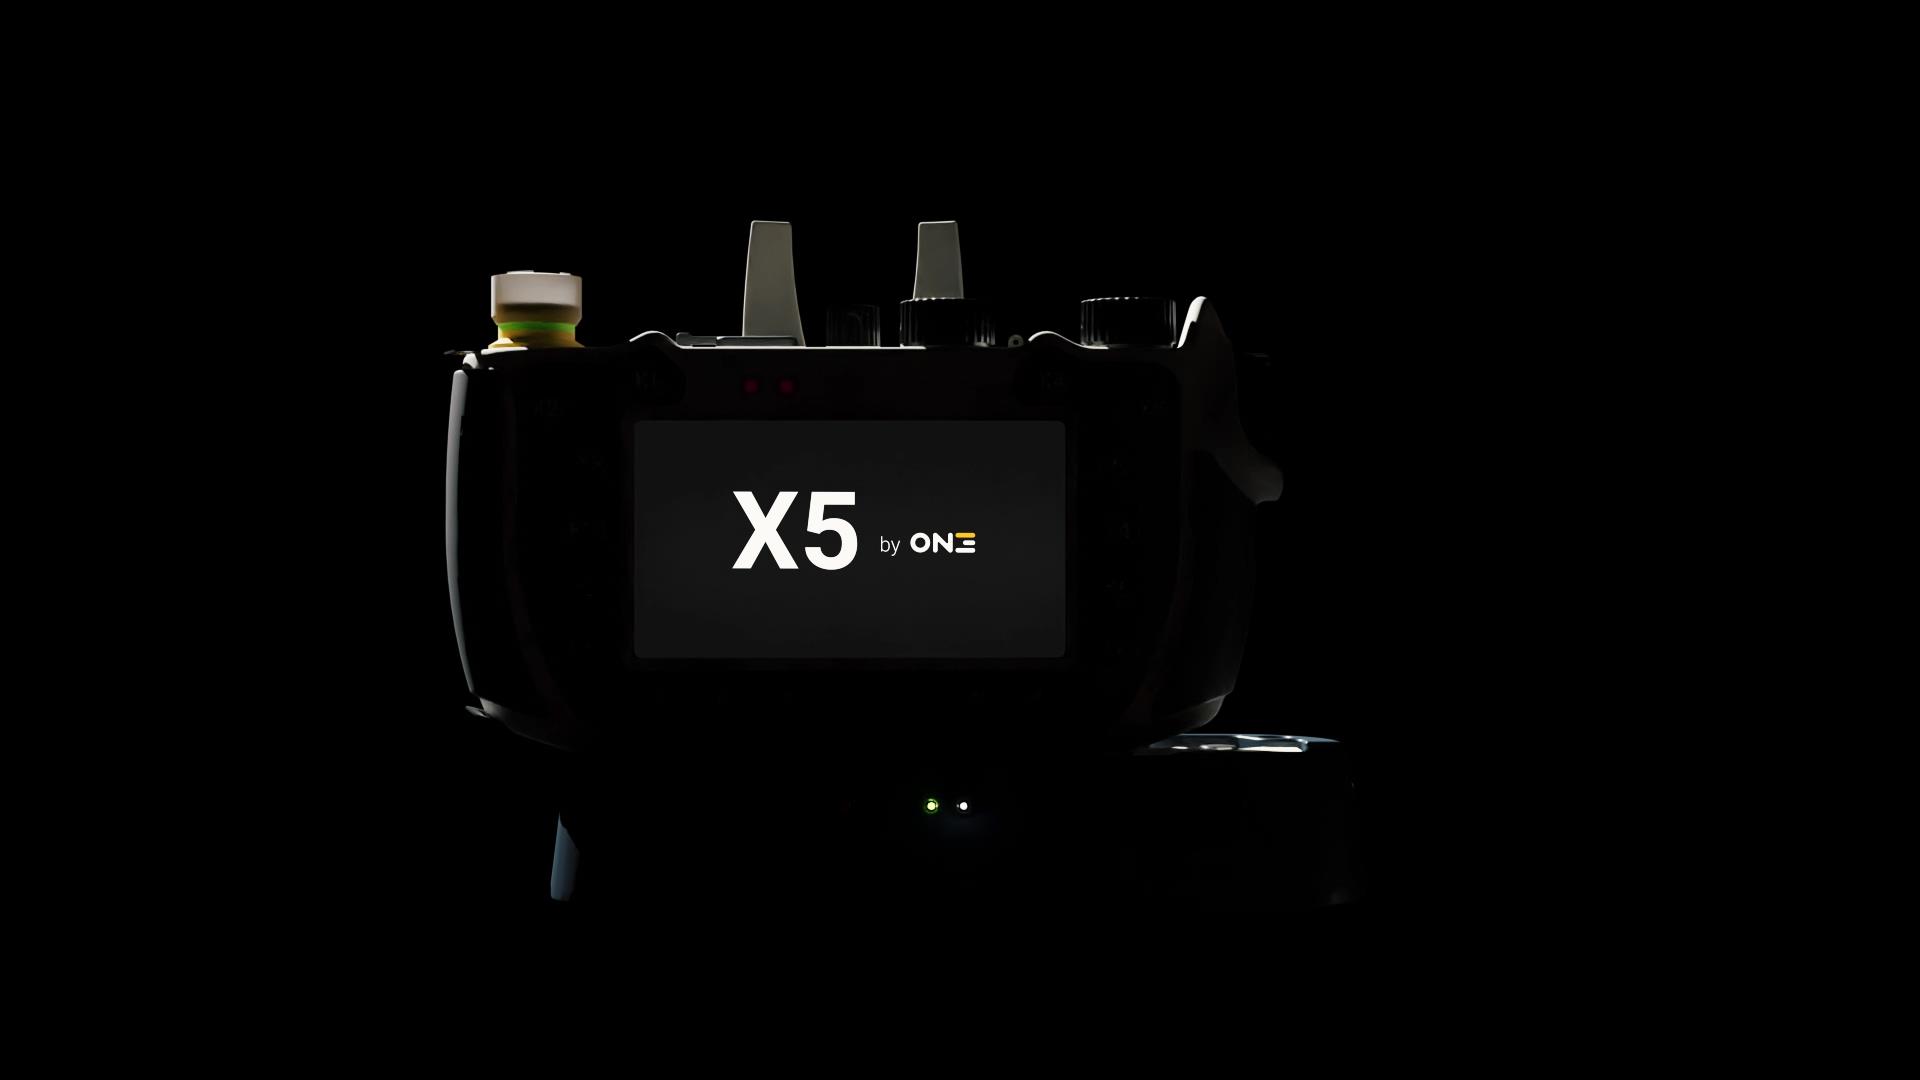 0N3_X5 Mobile HMI